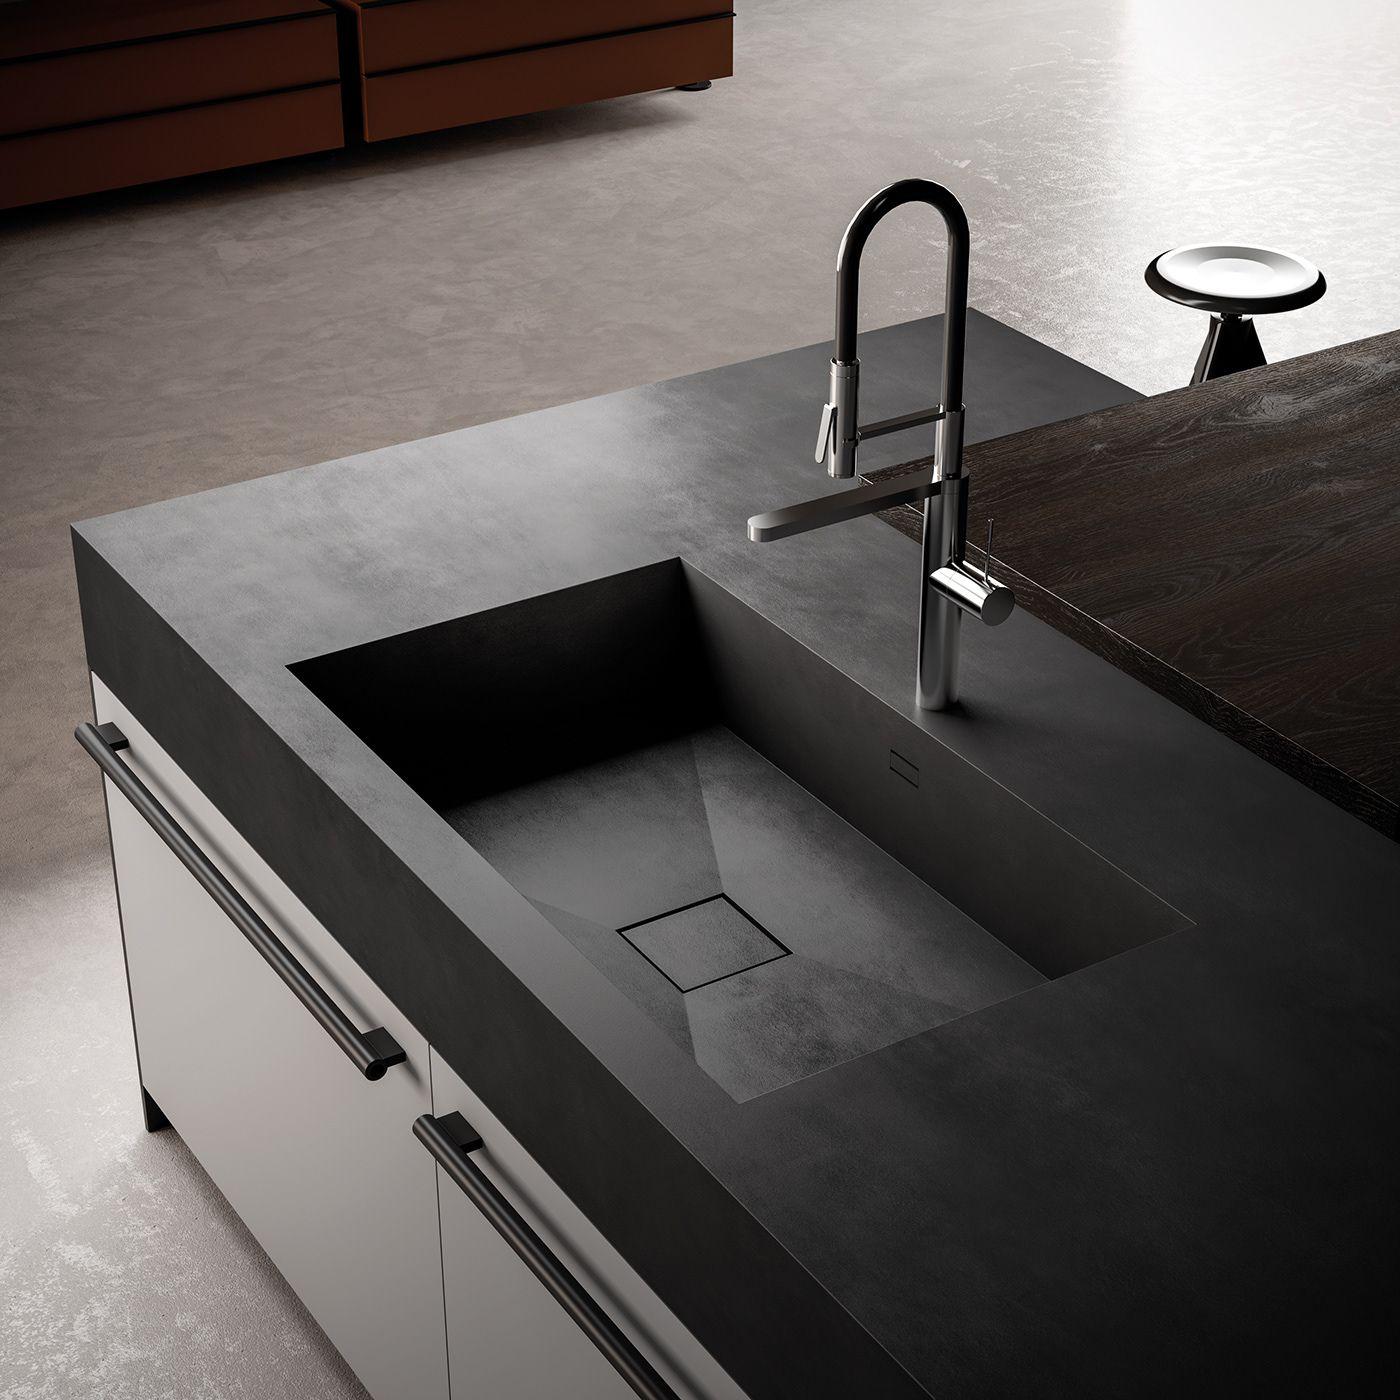 Effeti kitchen 2018 on behance bespoke kitchen design